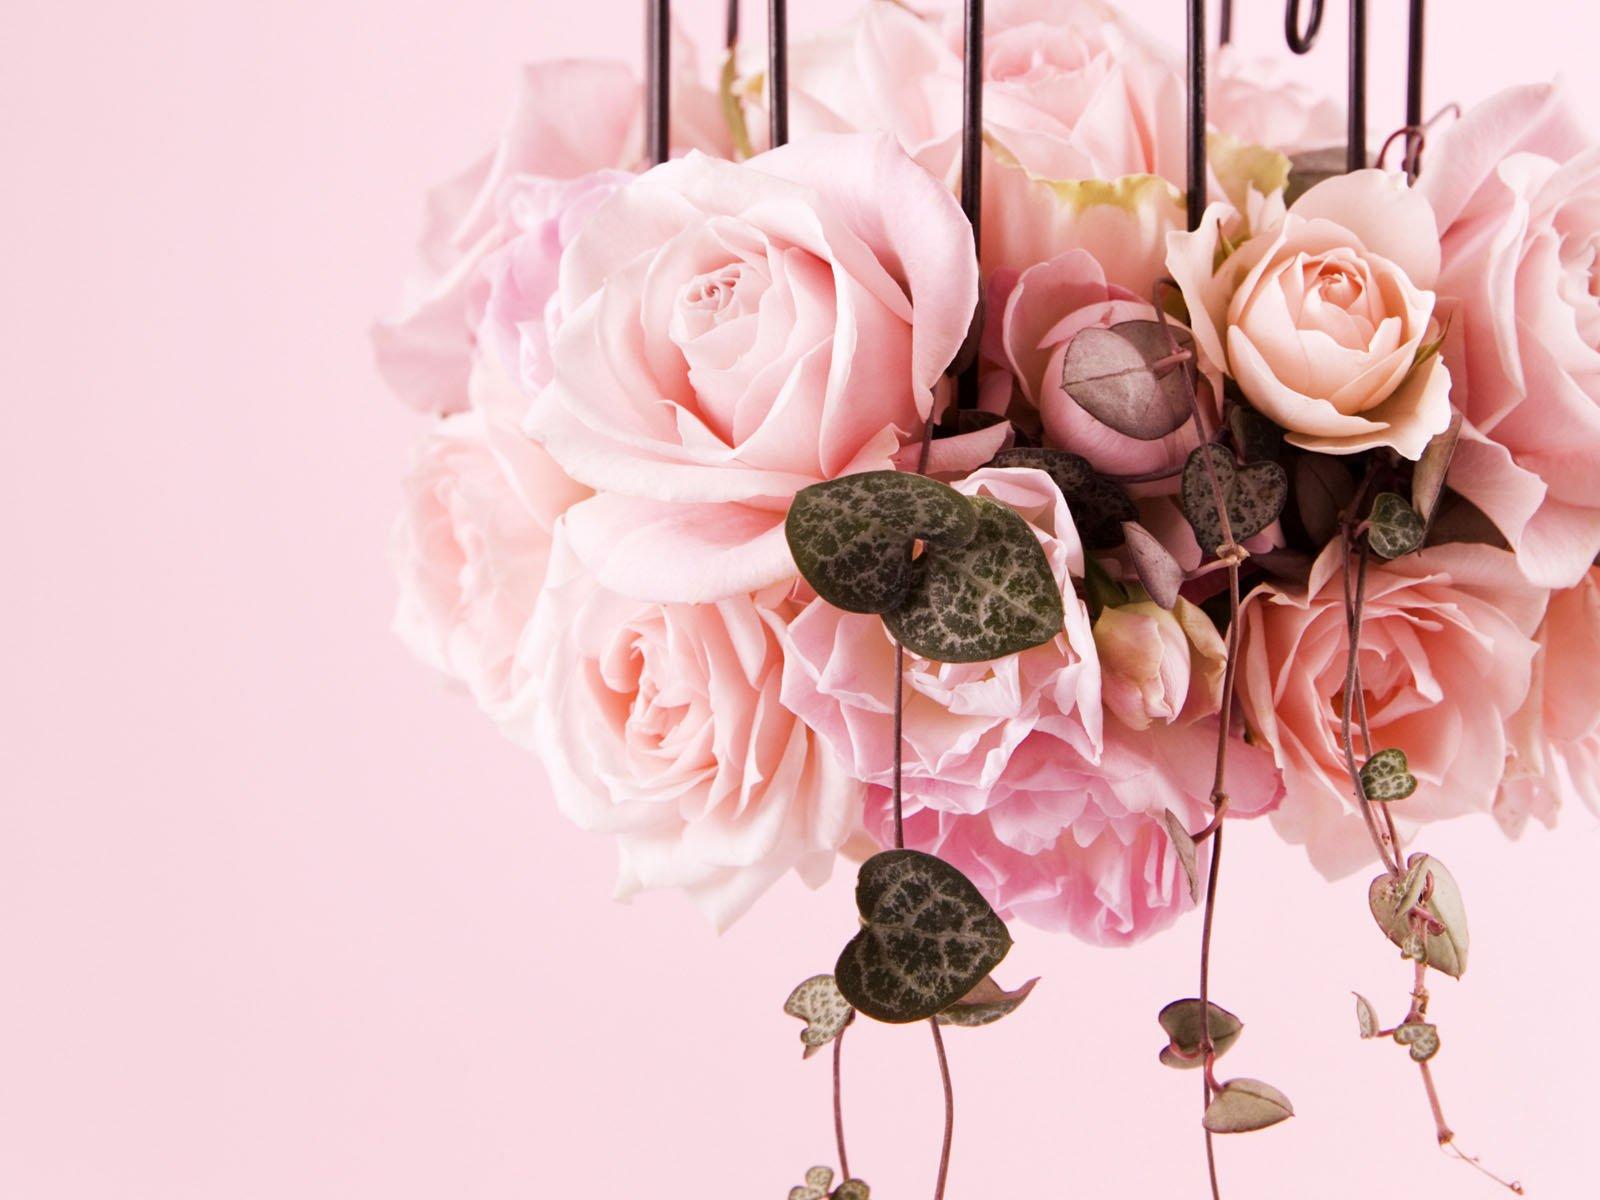 http://4.bp.blogspot.com/-aOPJHo_kvmw/TqWWOnGa7QI/AAAAAAAAB6s/fBsFZqo1yWU/s1600/Decorative_roses_bouquets.jpg